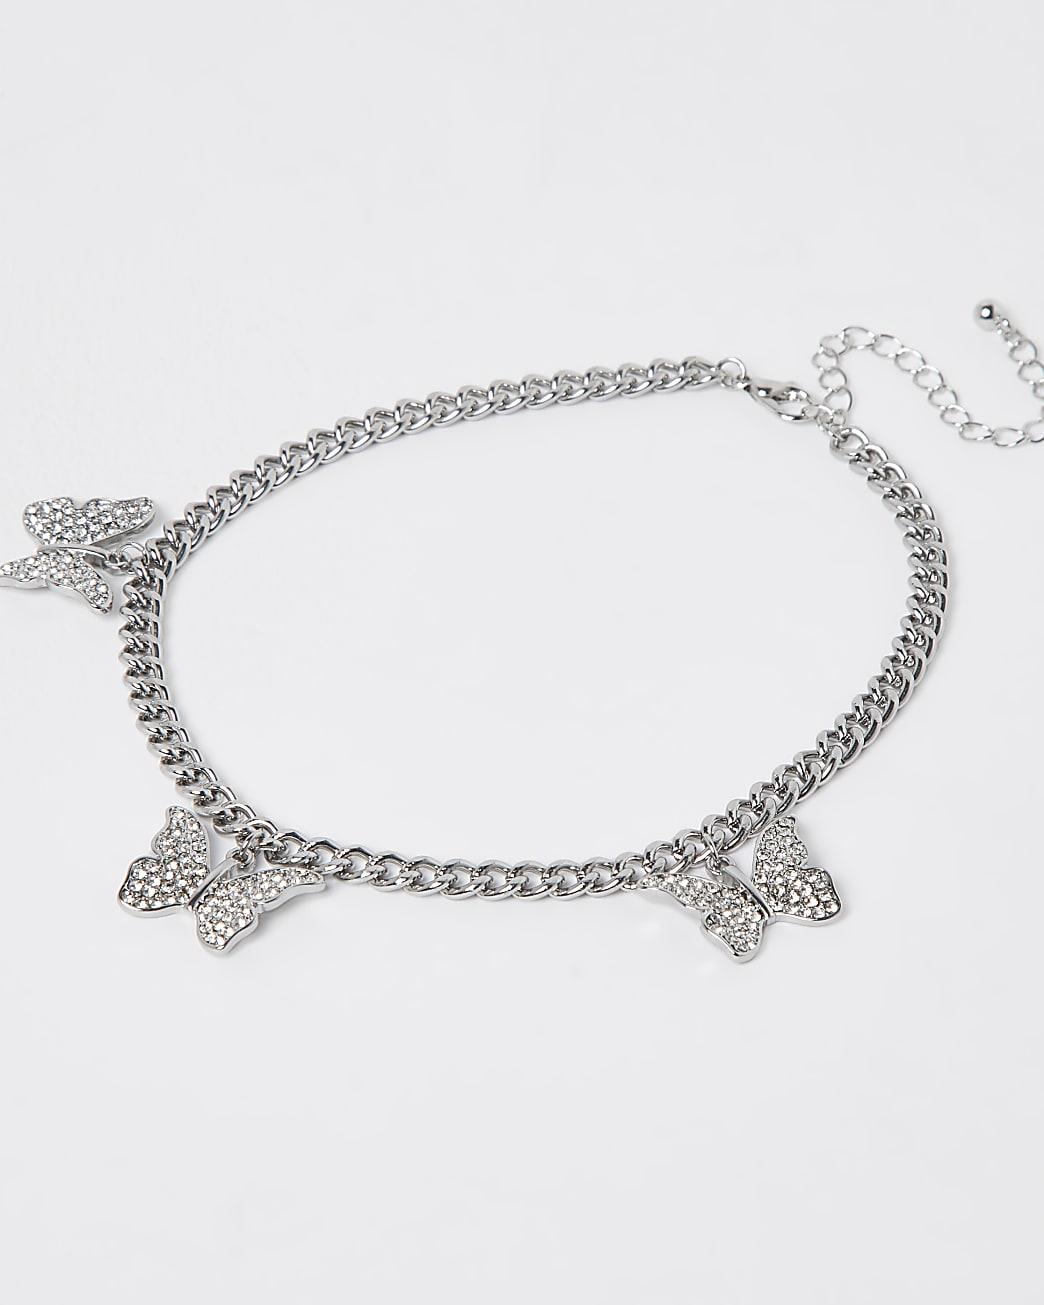 Silver crystal butterfly choker necklace